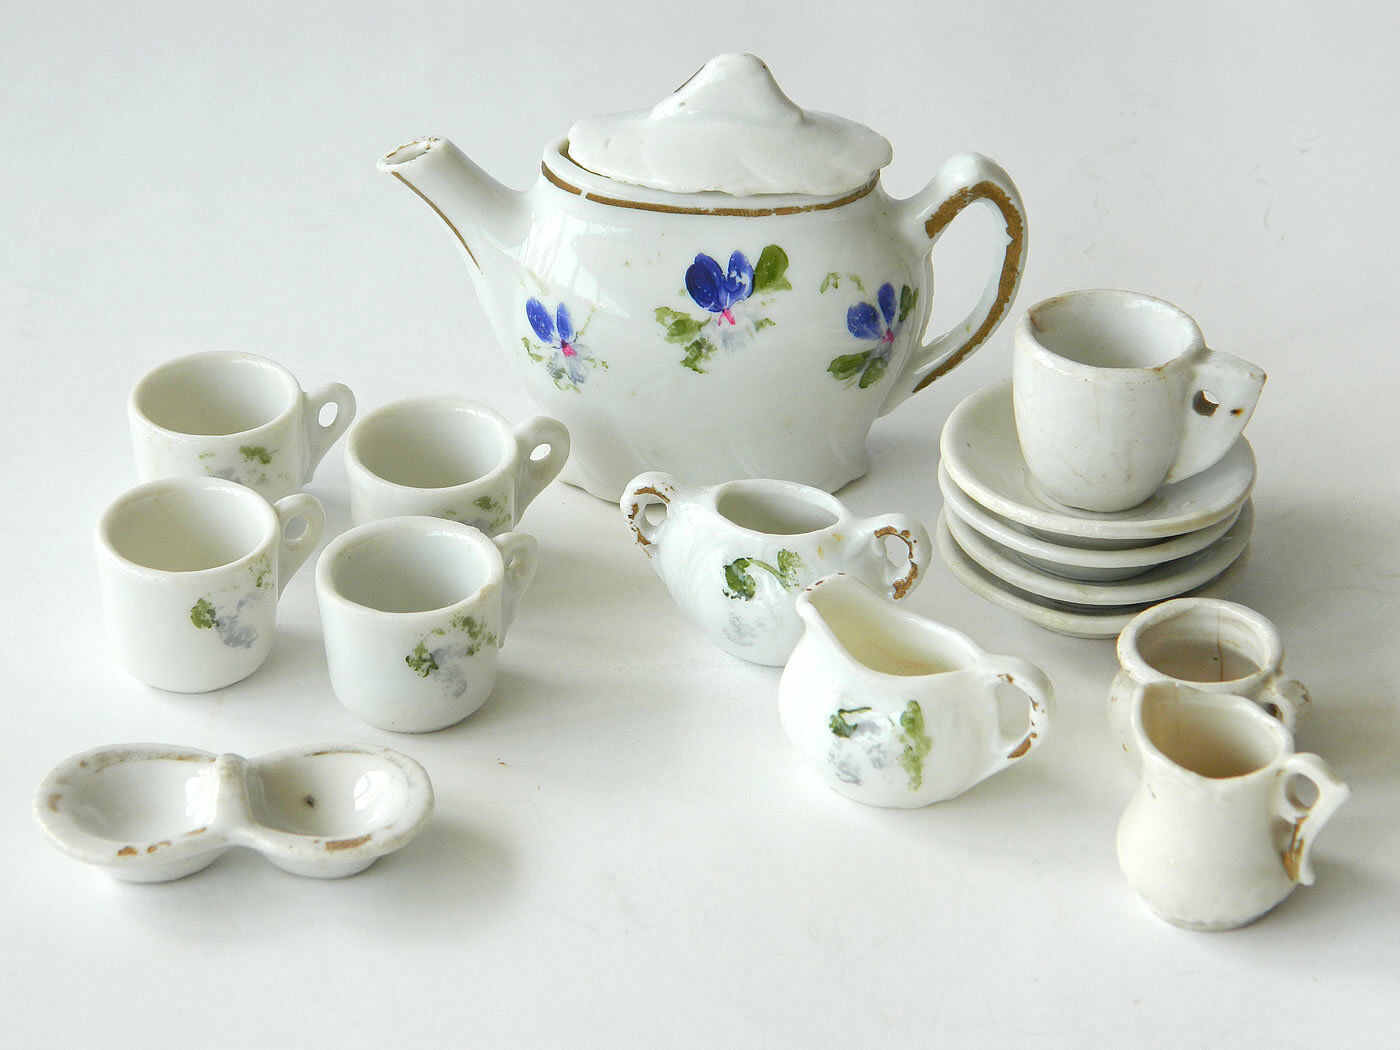 VTG MINIATURE PORCELAIN TEA TABLEWARE SET Deco Dollhouse Miniature